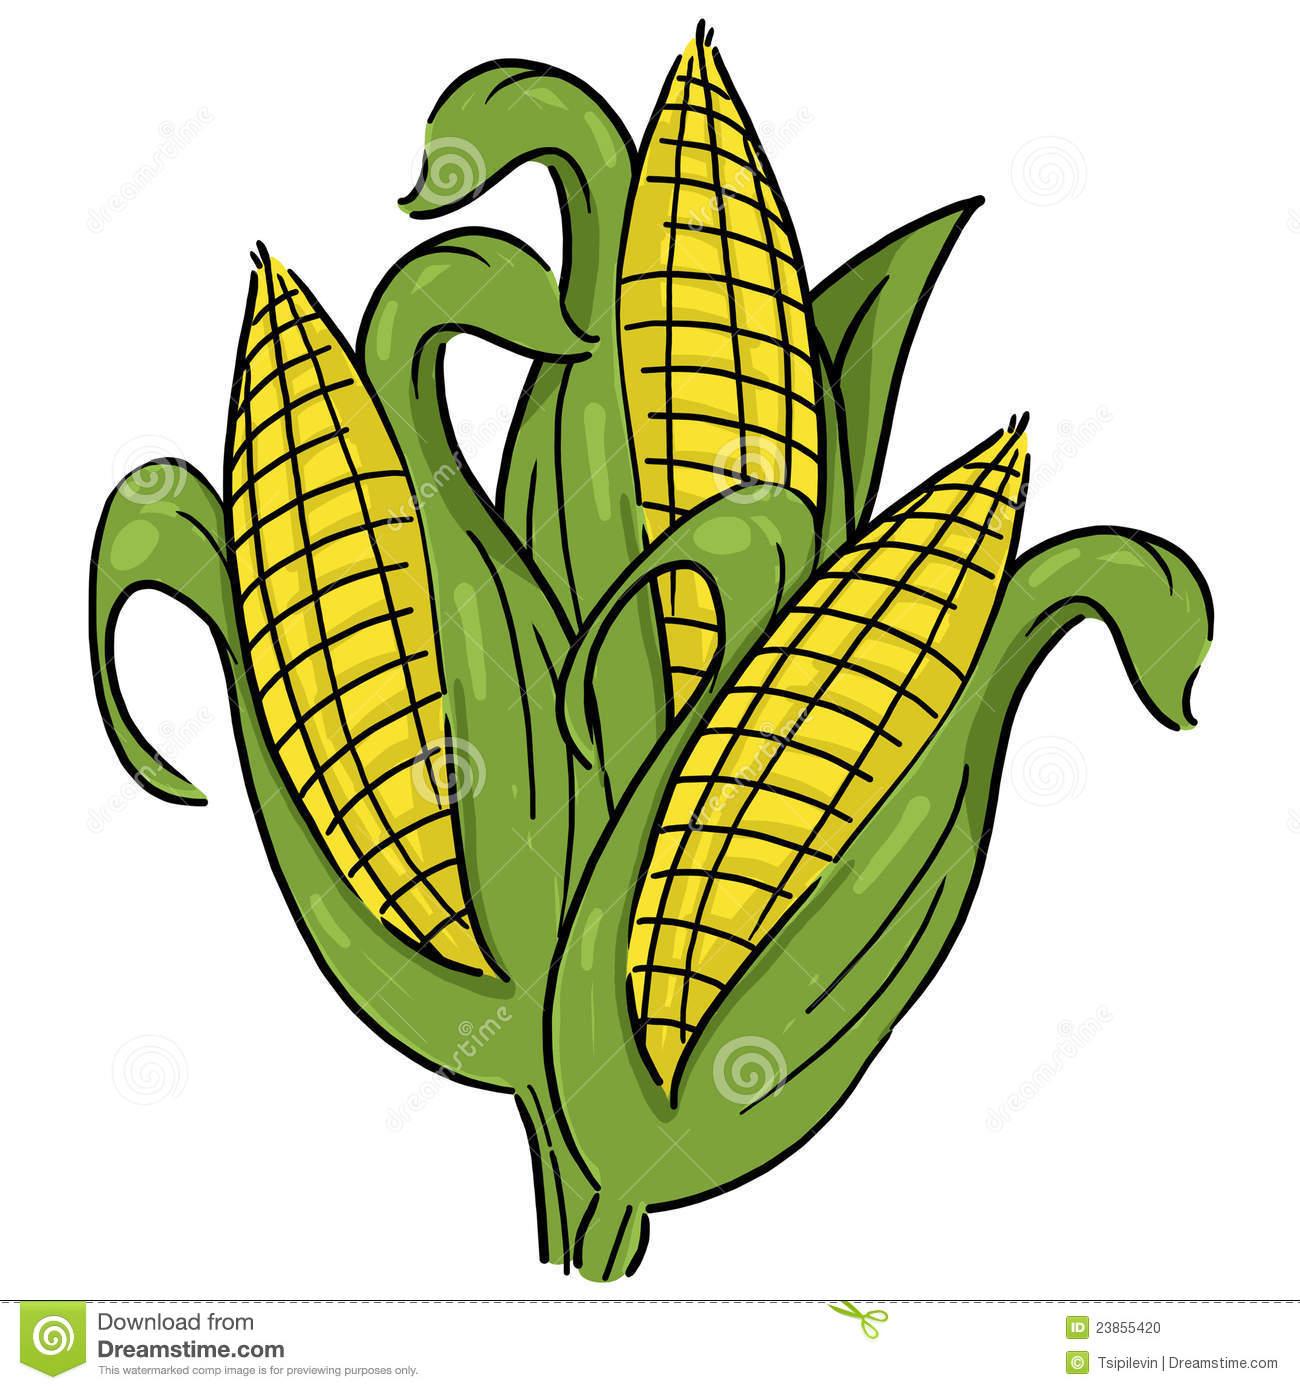 Corn Crops Clipart Ears Of Corn Illustra-Corn Crops Clipart Ears Of Corn Illustration-15